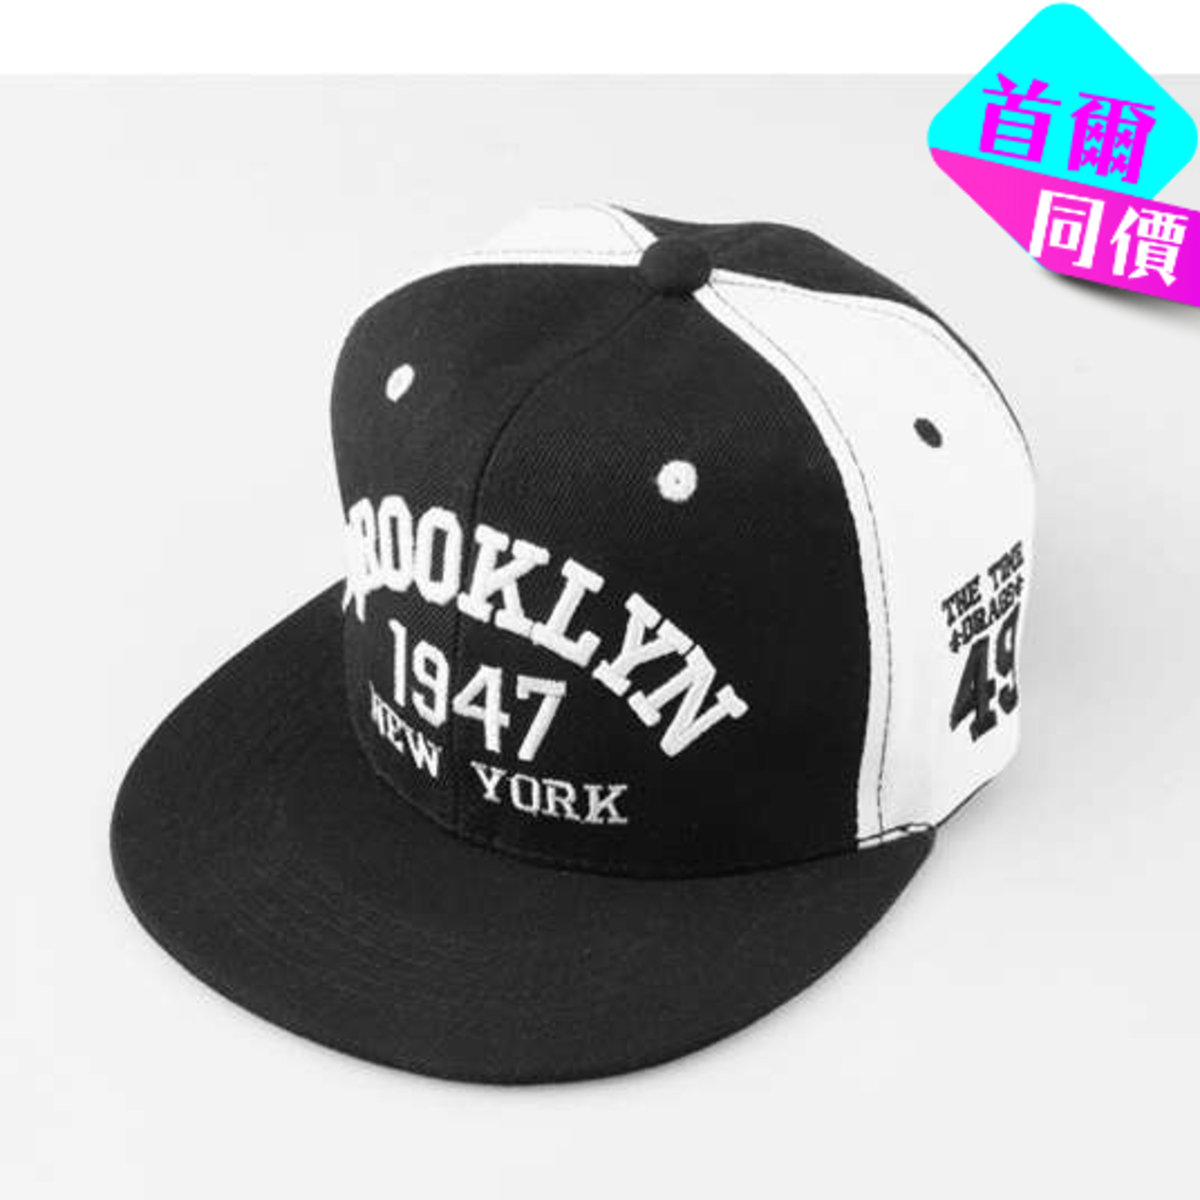 Brooklyn棒球帽_CA1_150709330